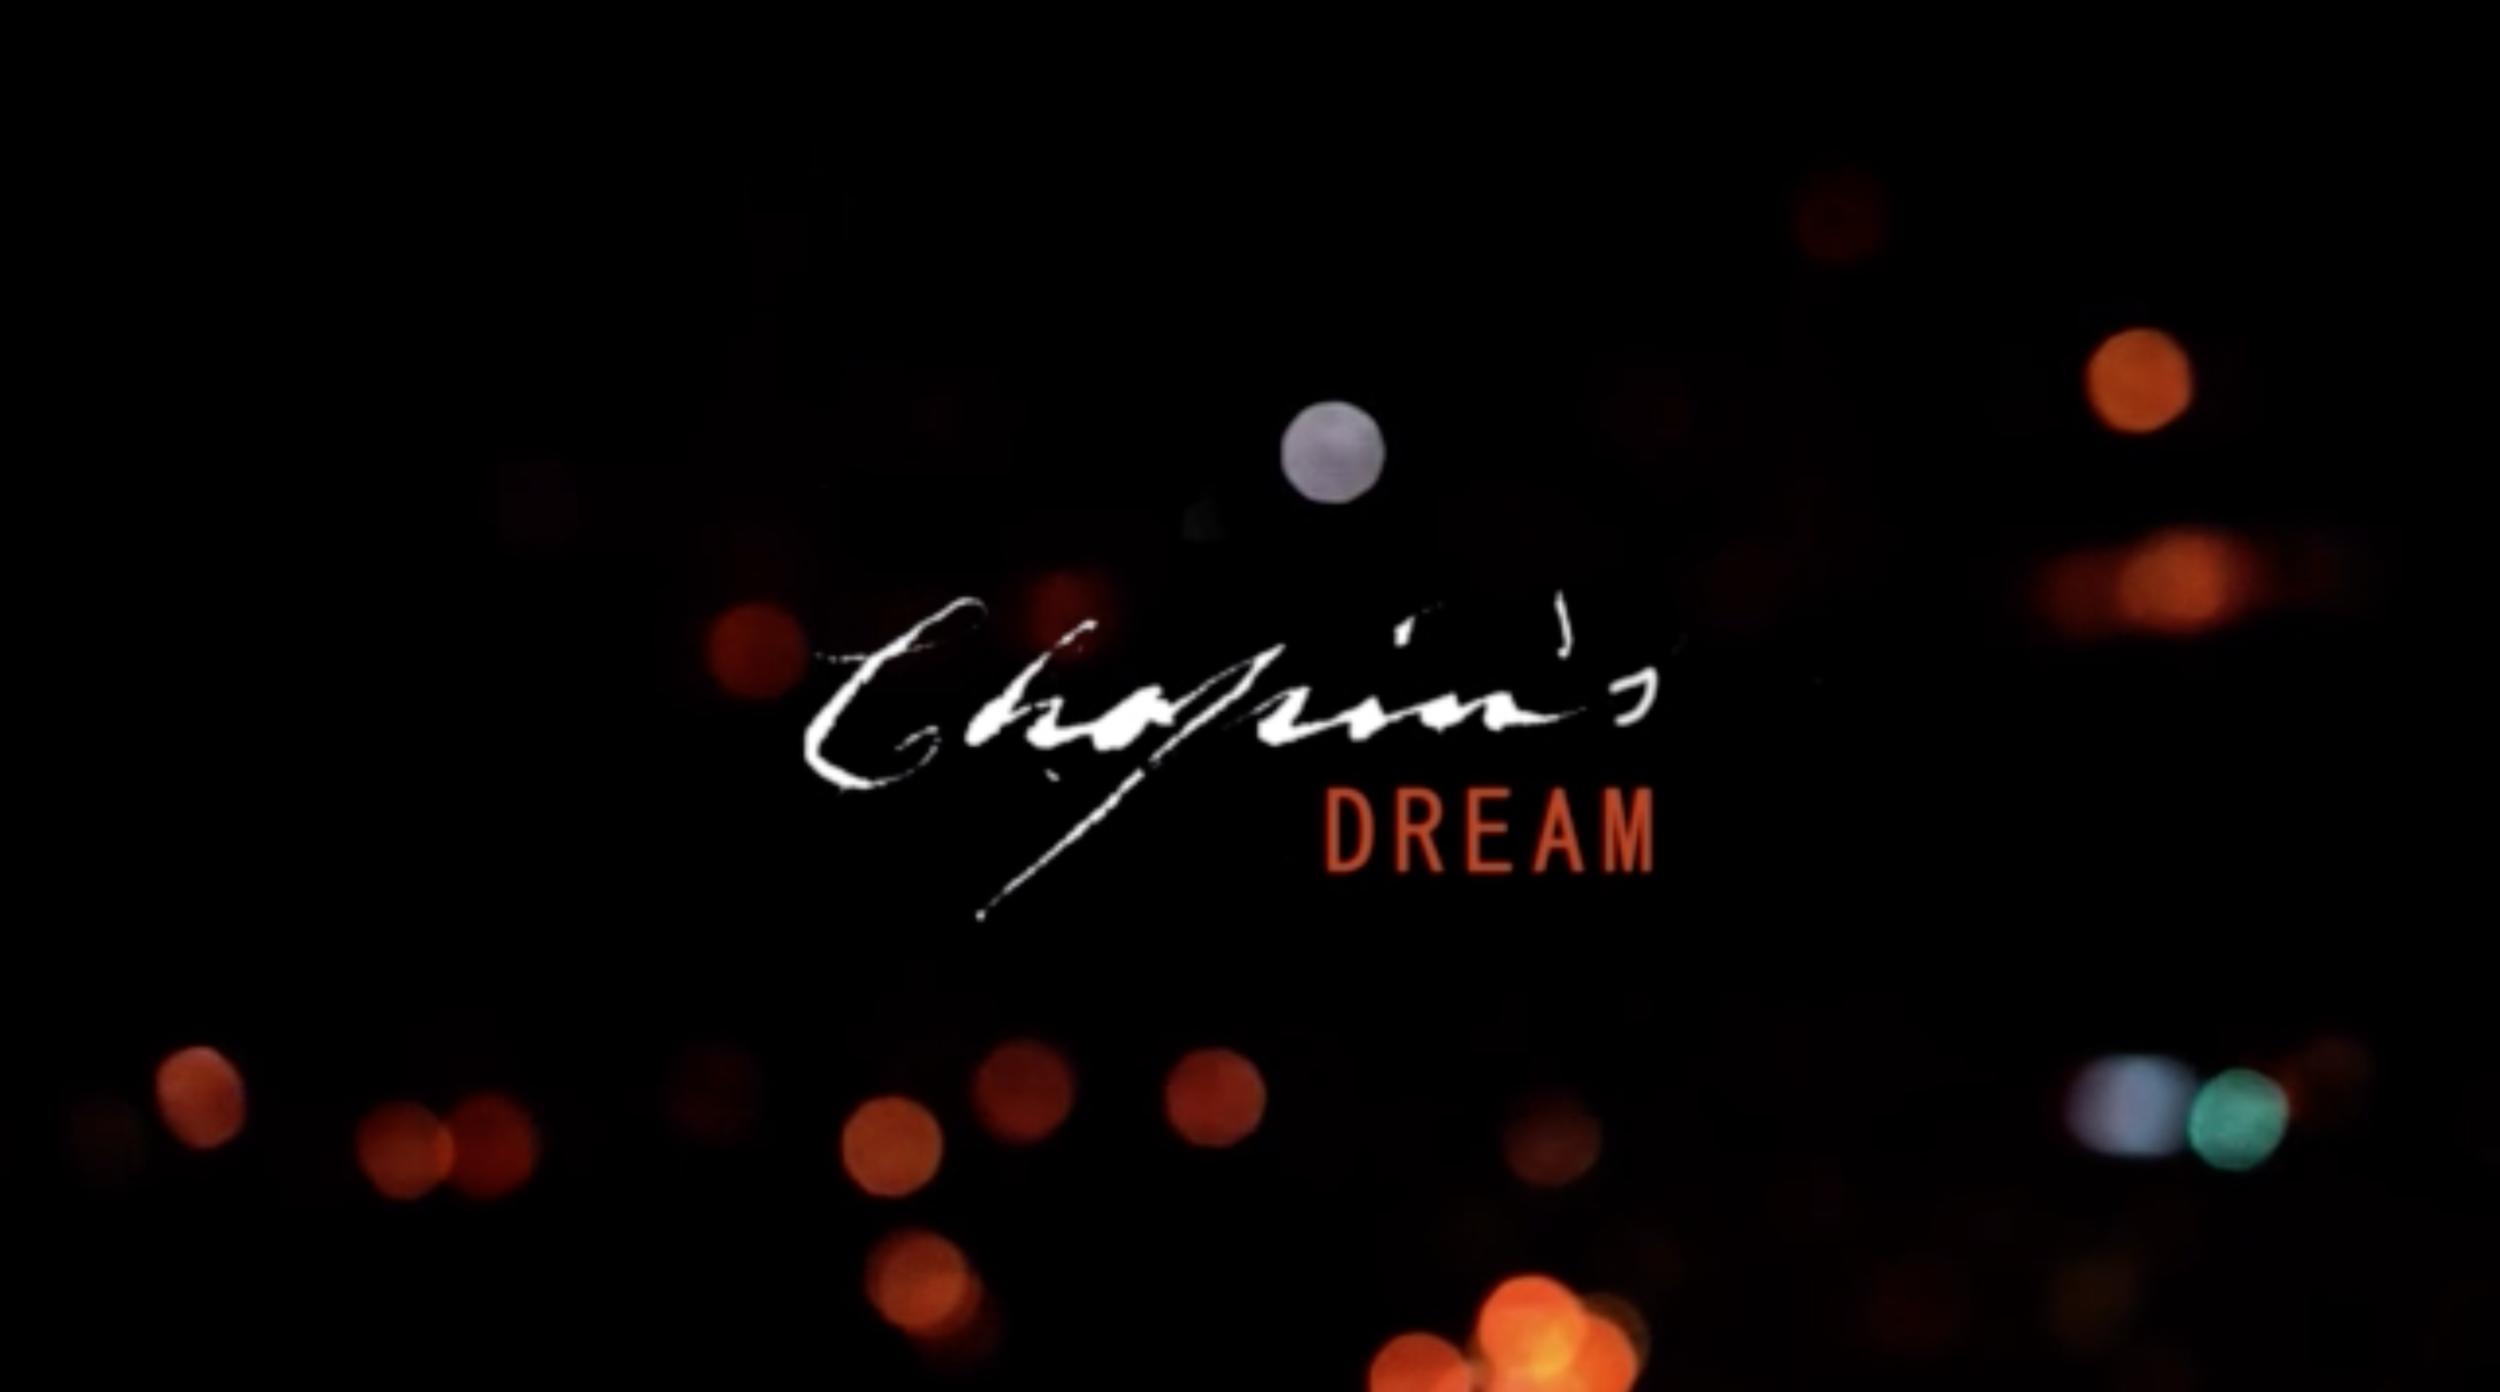 ChopinsDream.png